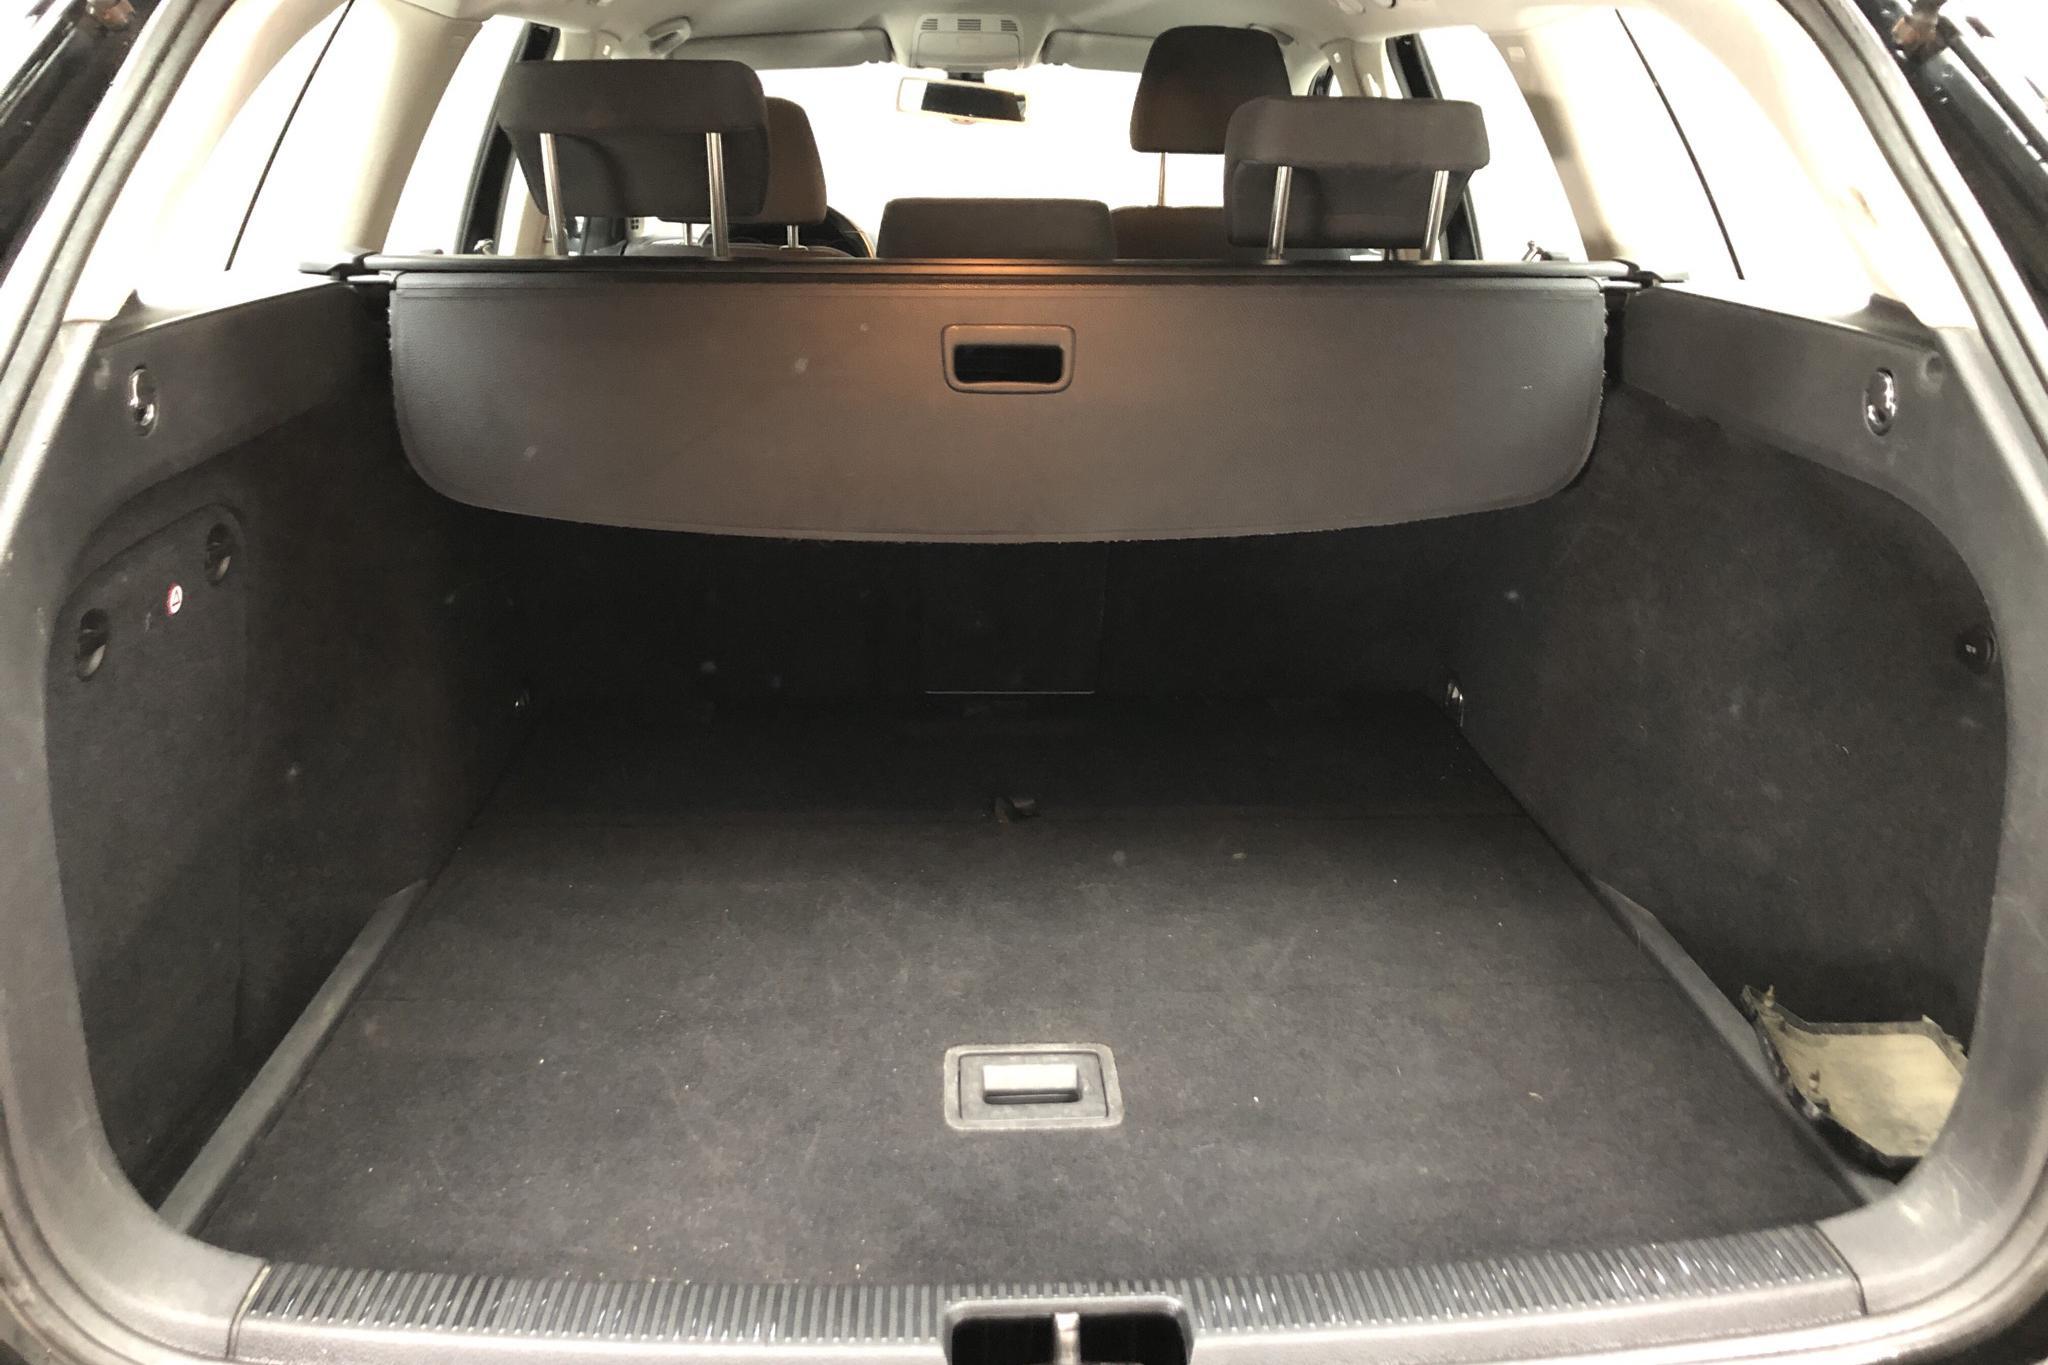 VW Golf VI 1.6 TDI Variant (105hk) - 20 415 mil - Manuell - svart - 2012